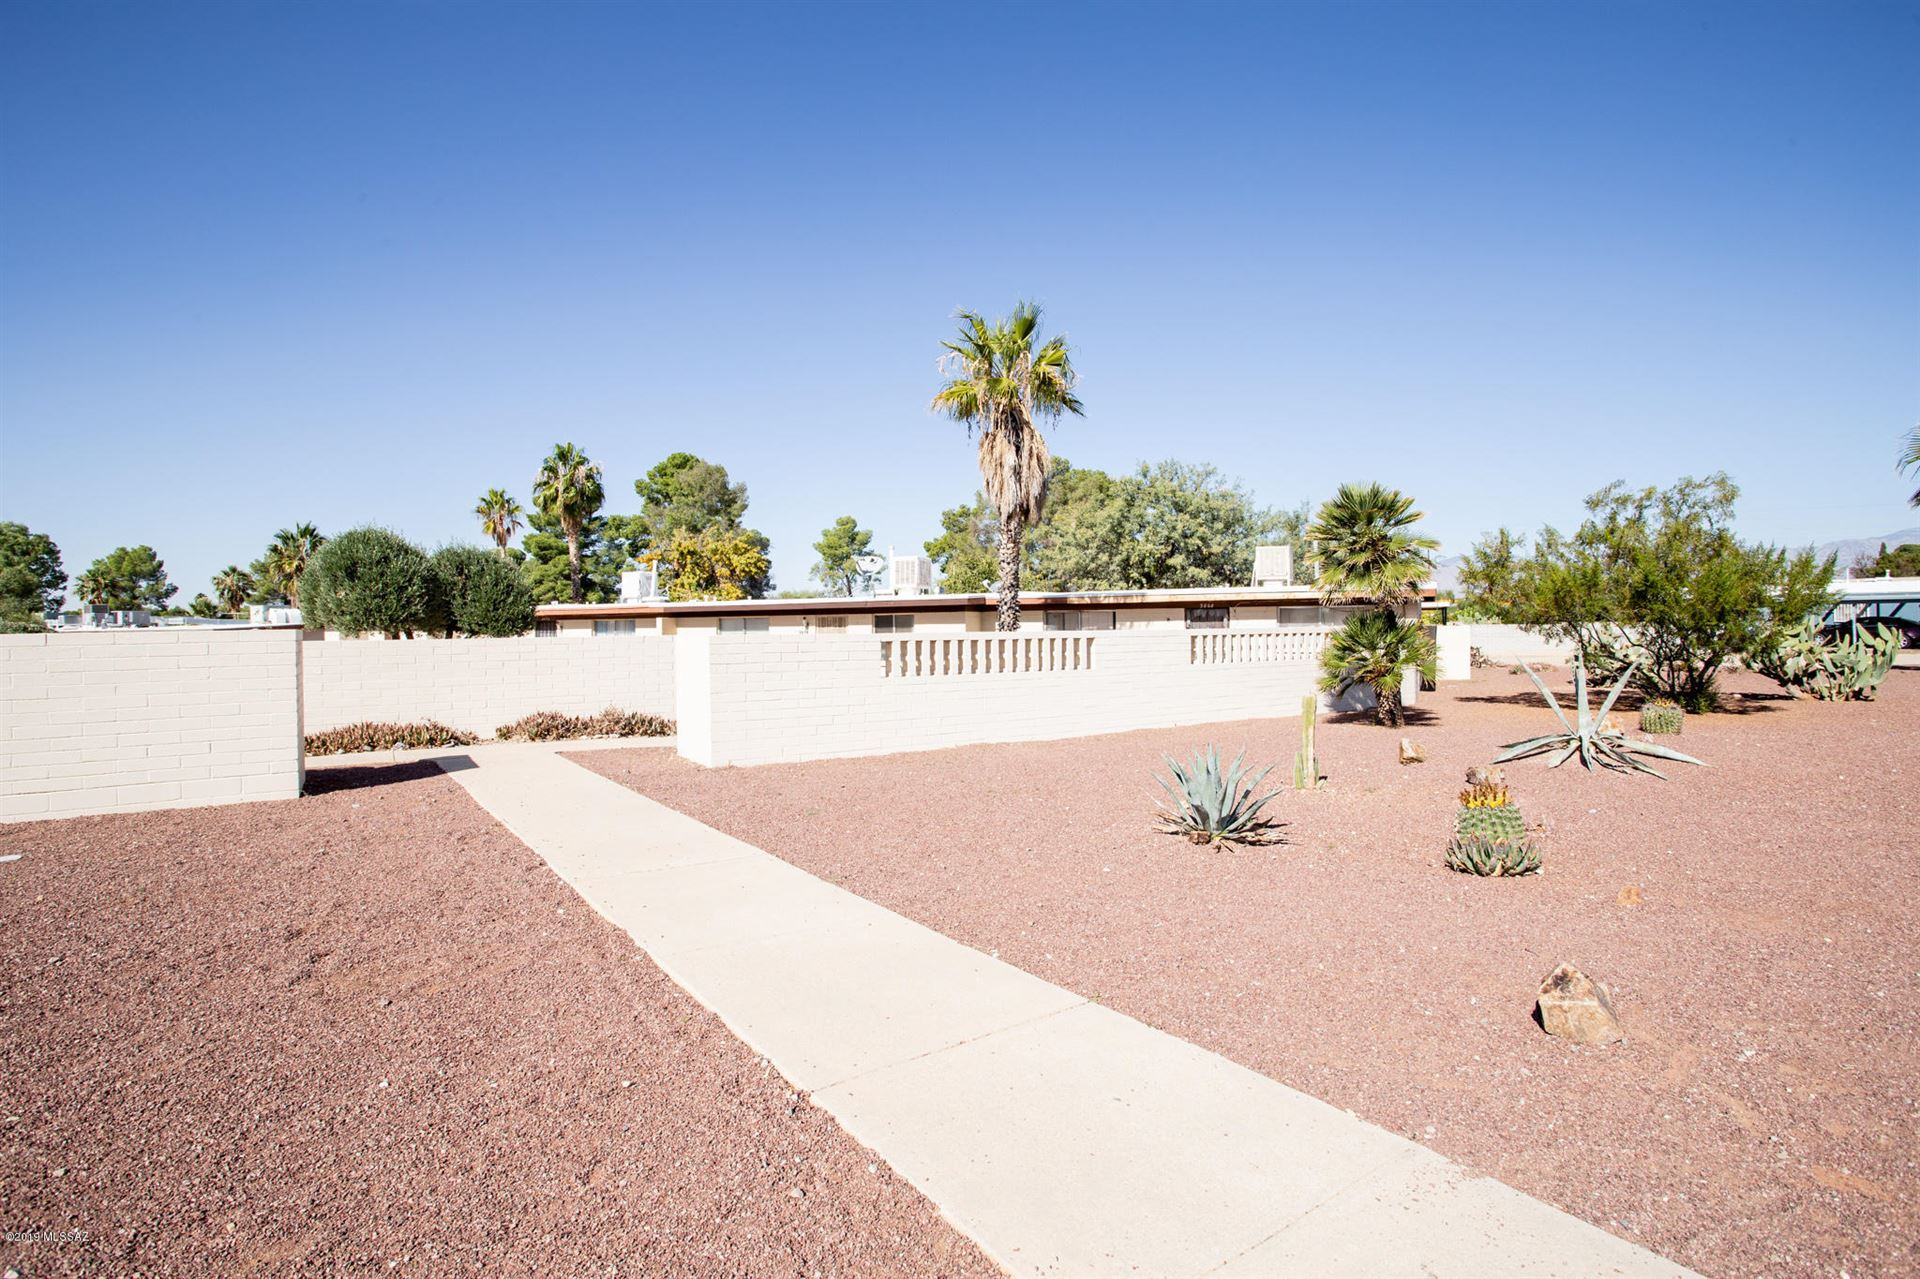 3870 S Evergreen Avenue, Tucson, AZ 85730 - MLS#: 22011547